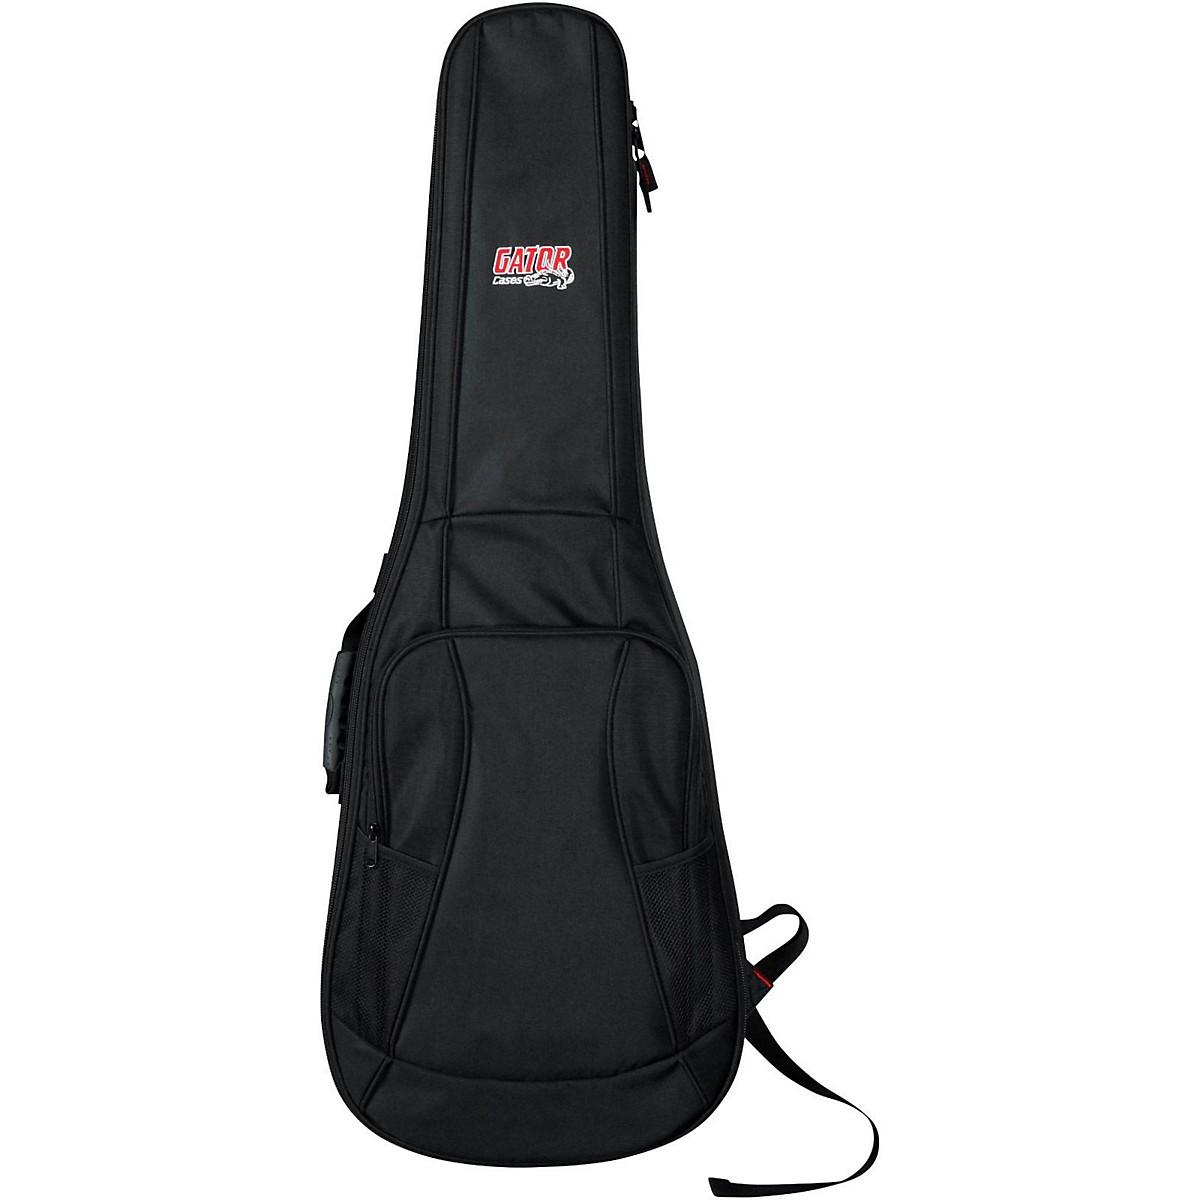 Gator GB-4G-ELECX2 4G Series Gig Bag for 2 Electric Guitars